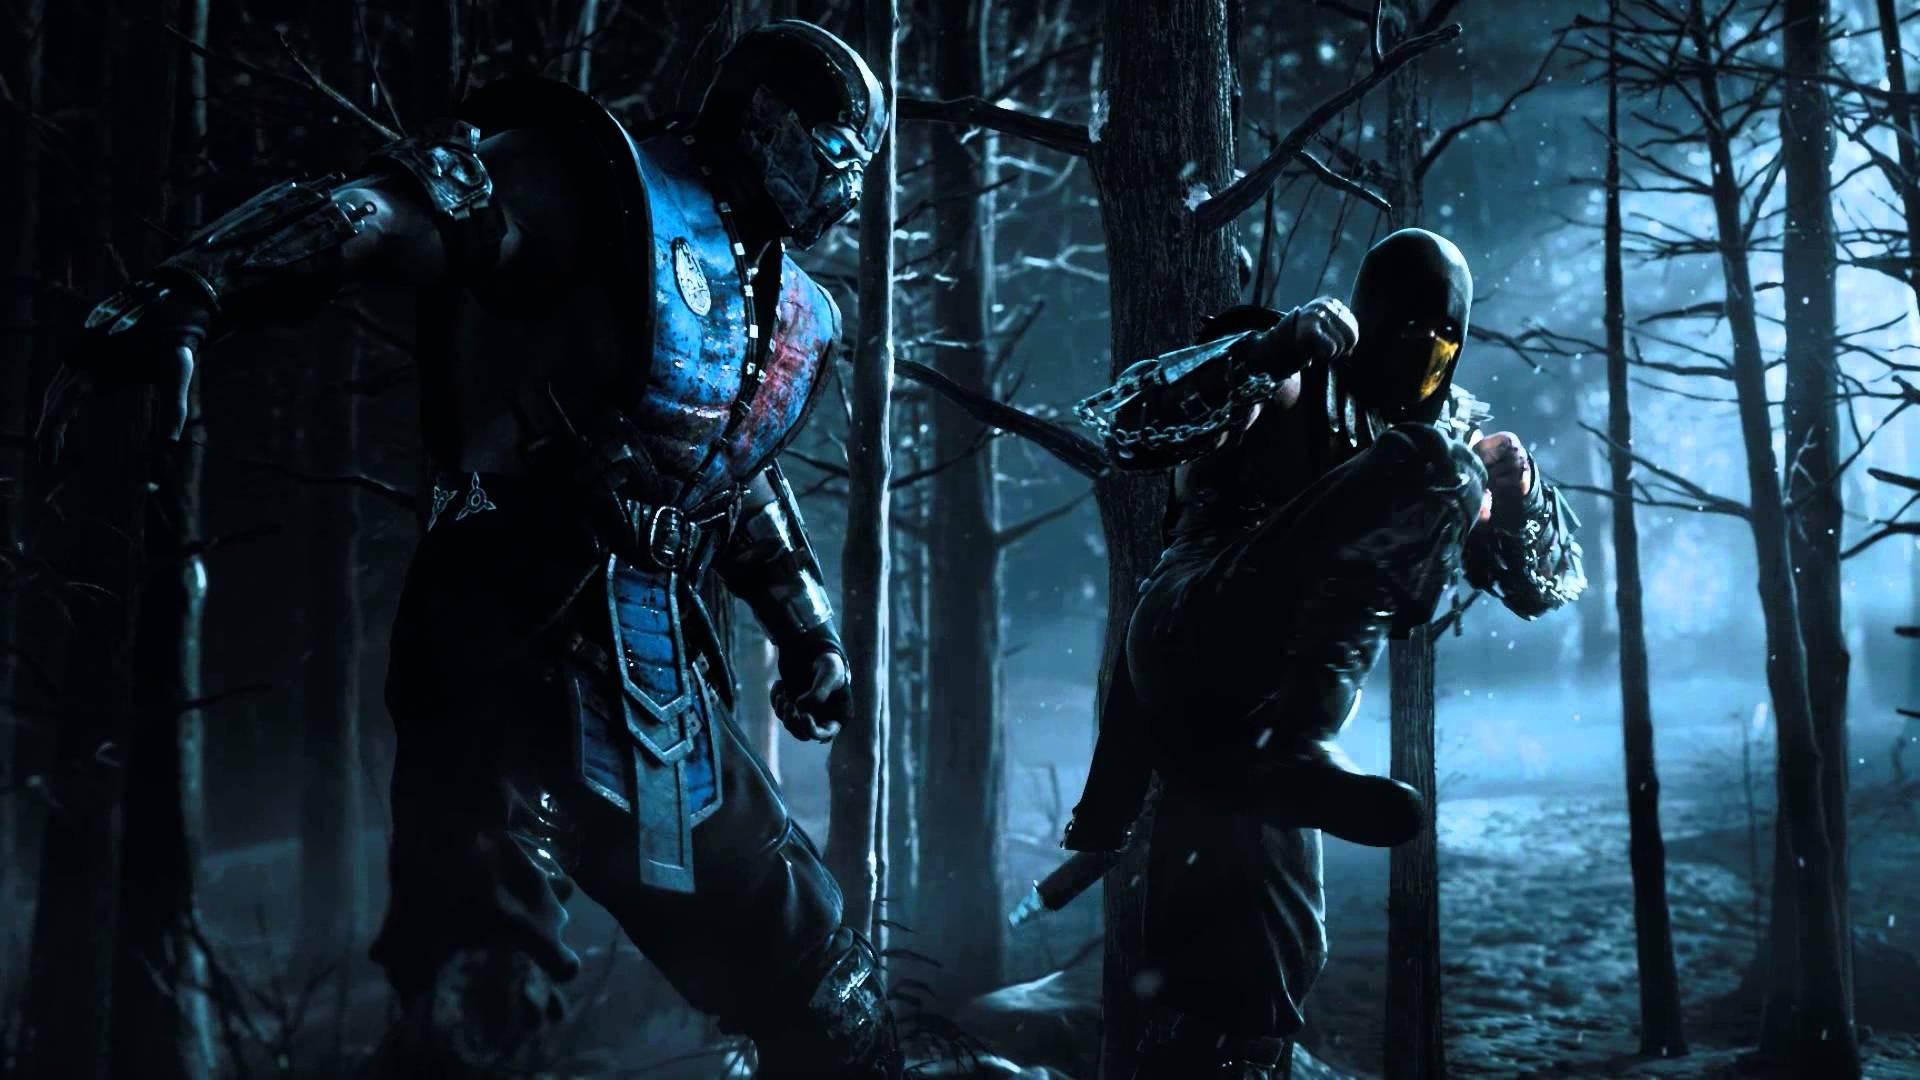 Mortal Kombat X Is No Longer Coming To Playstation 3 And Xbox 360